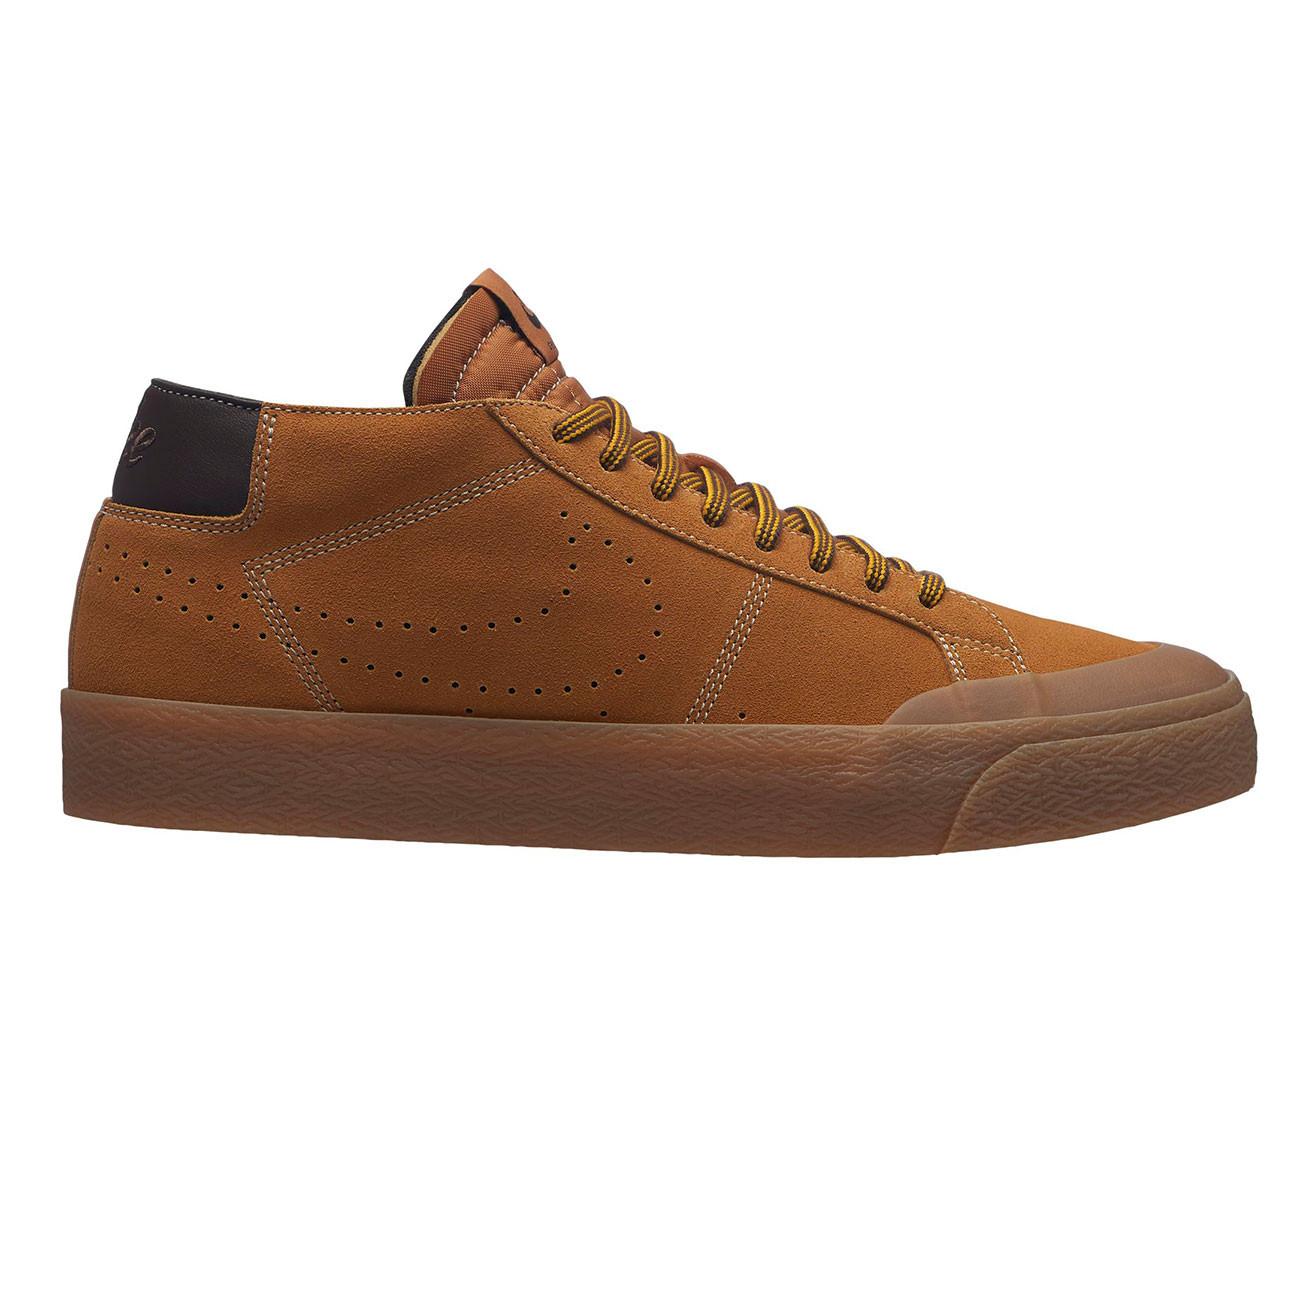 deba043059845 Sneakers Nike SB Zoom Blazer Chukka XT Premium bronze bronze-baroque brown